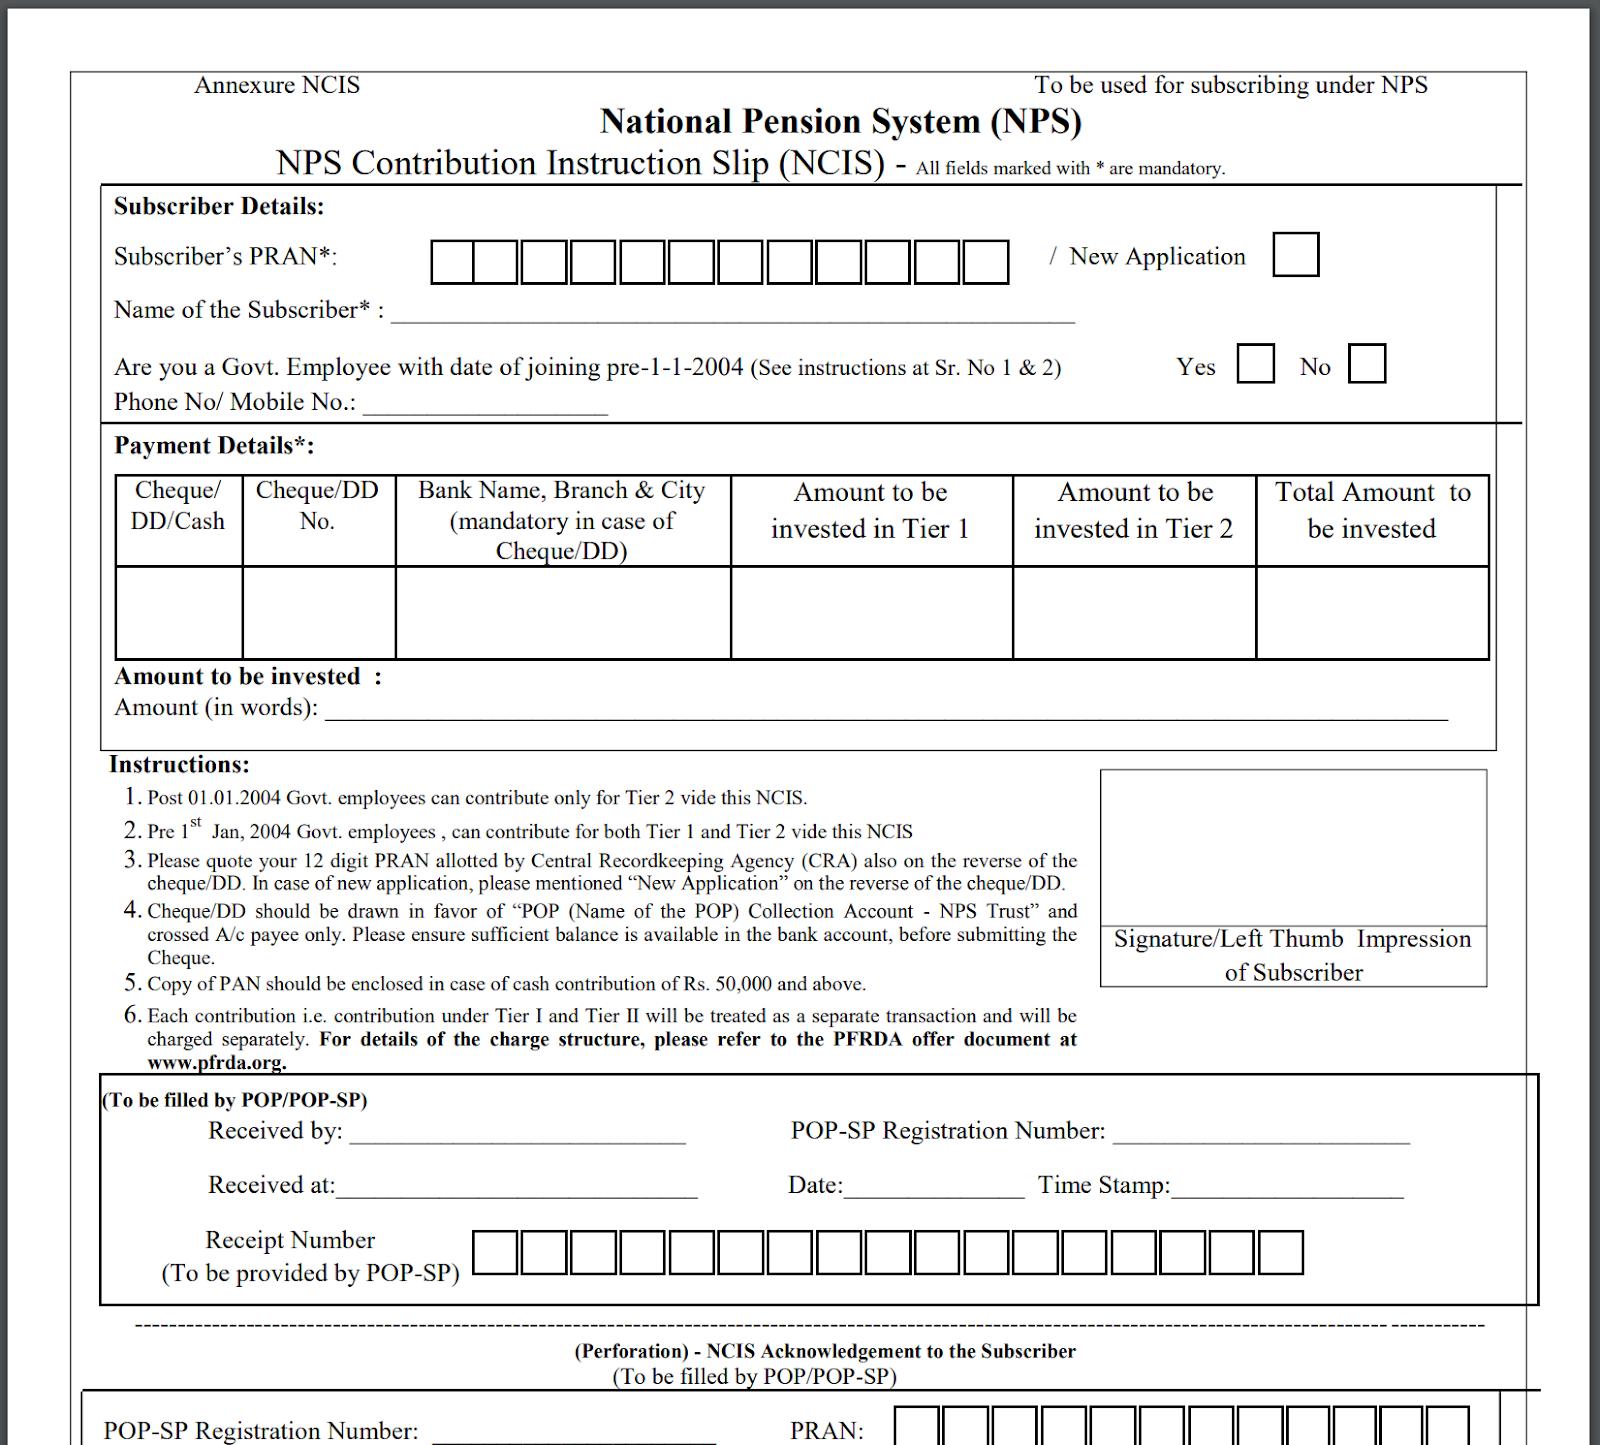 Screenshot of the NPS Contribution Instruction Slip (NCIS)